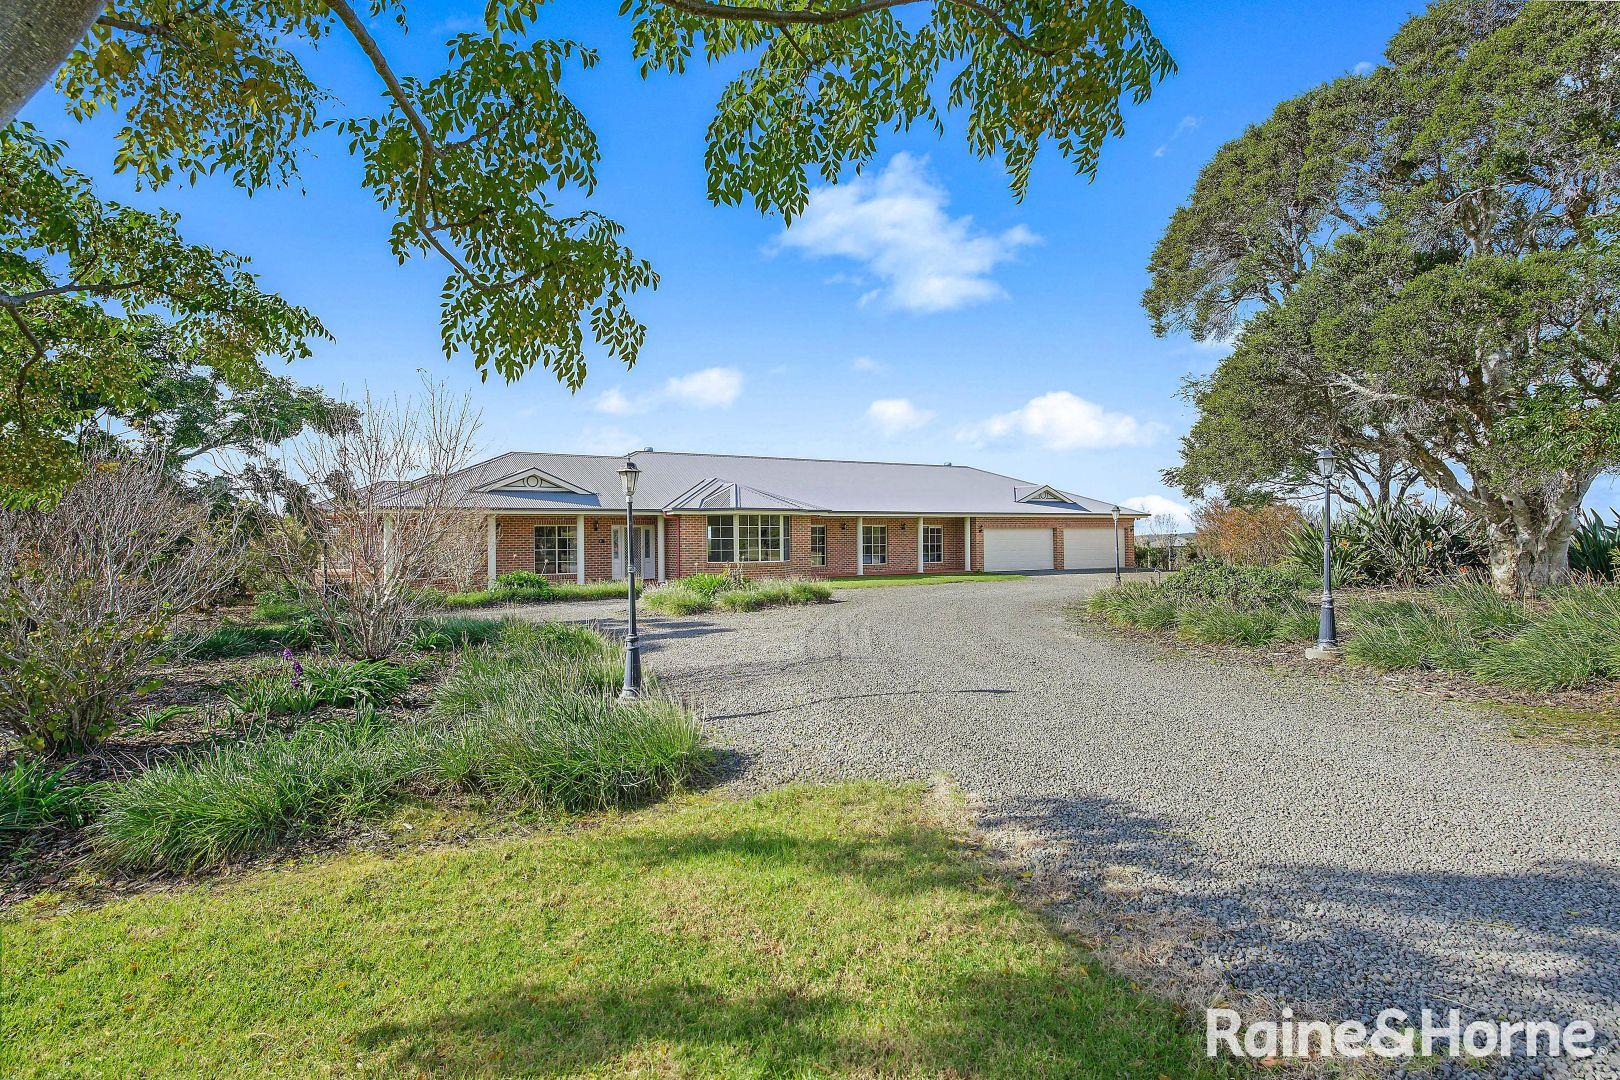 36B Monteith Way, Falls Creek NSW 2540, Image 1